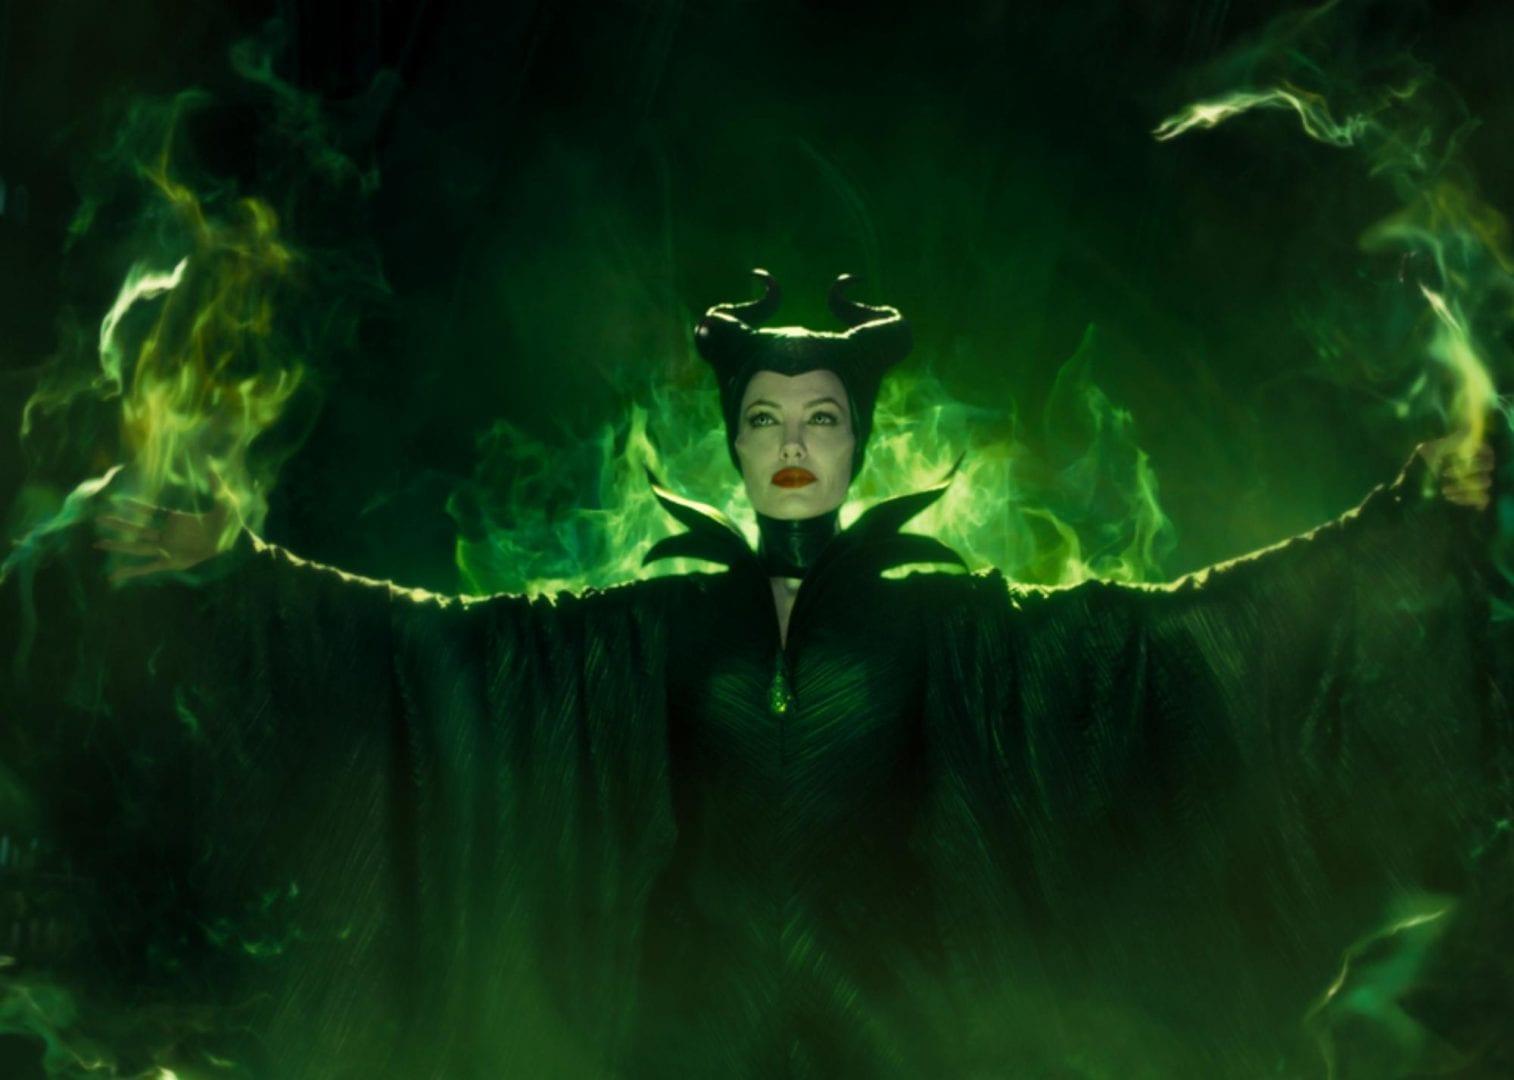 Maleficent: Mistress of Evil – Trailer #1